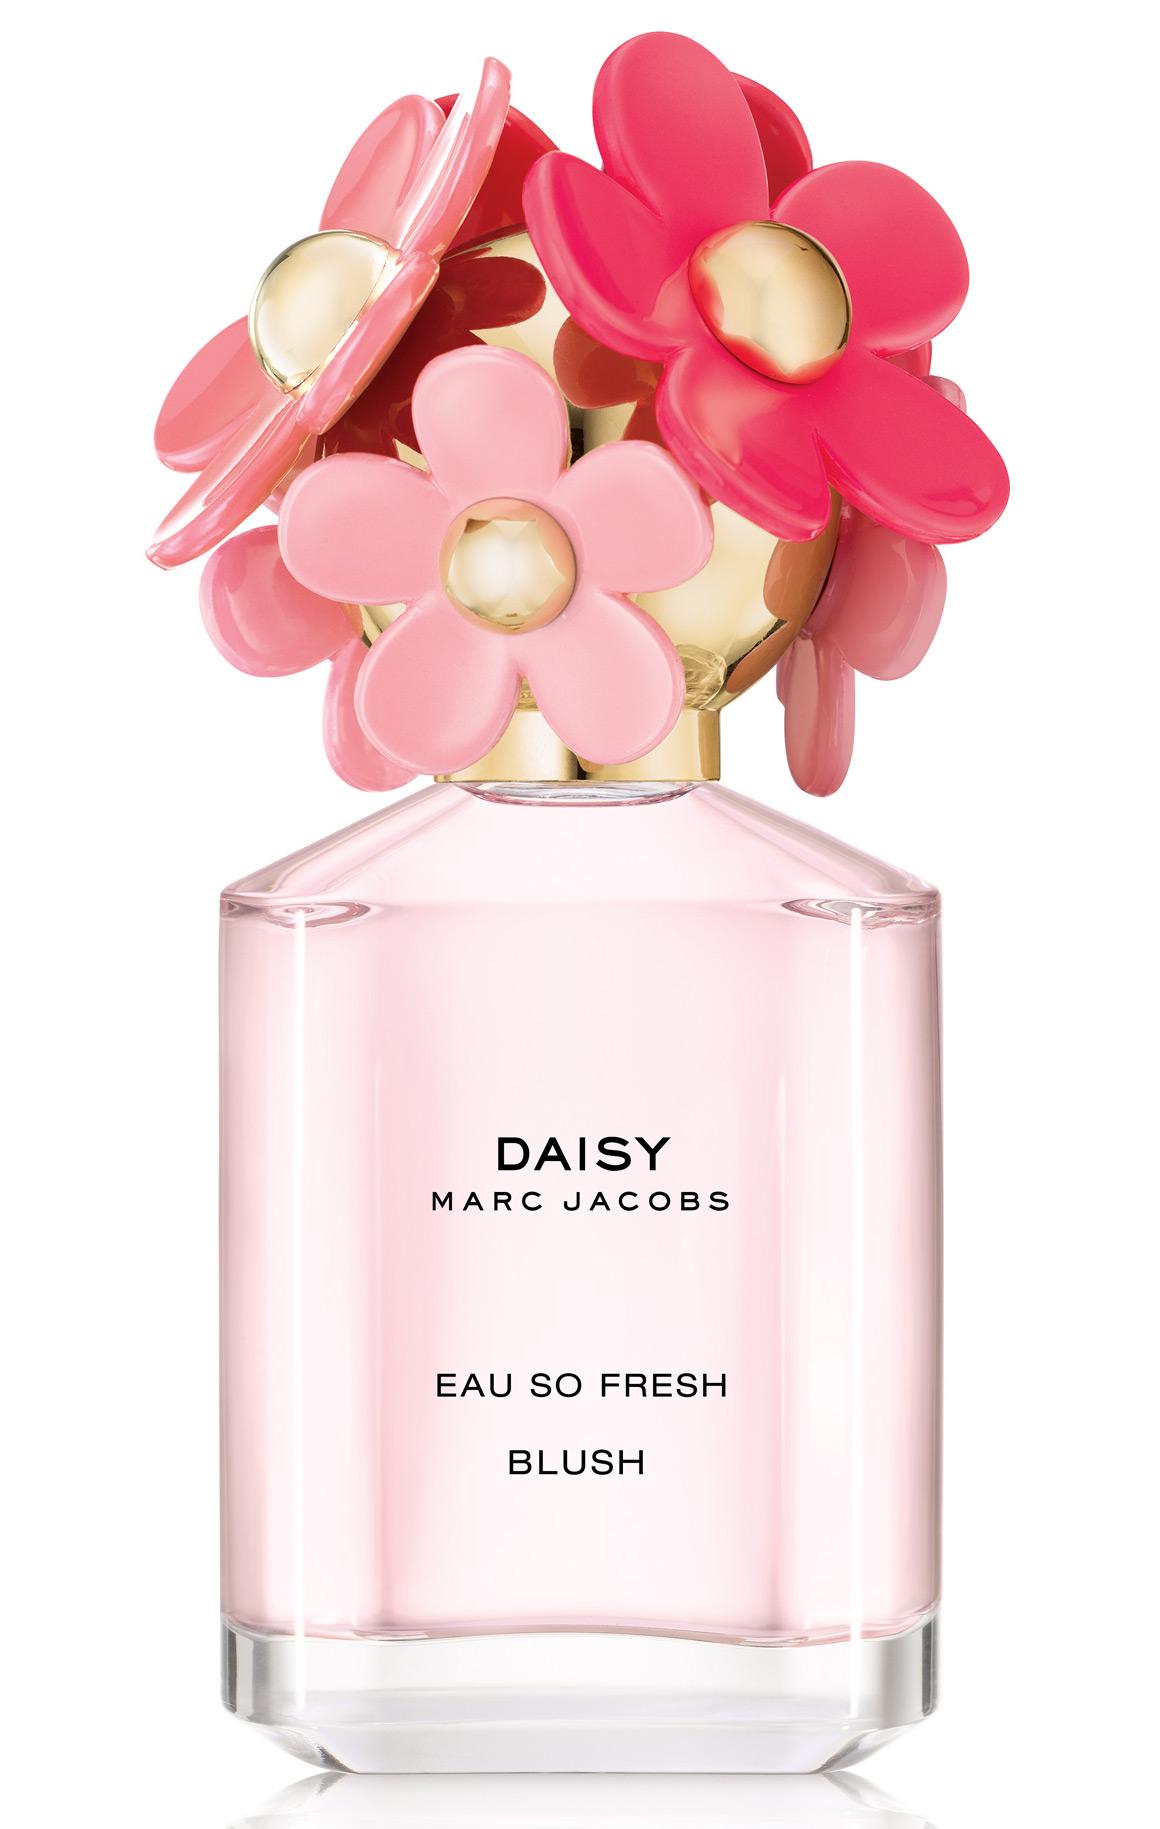 daisy eau so fresh blush marc jacobs perfume a new. Black Bedroom Furniture Sets. Home Design Ideas